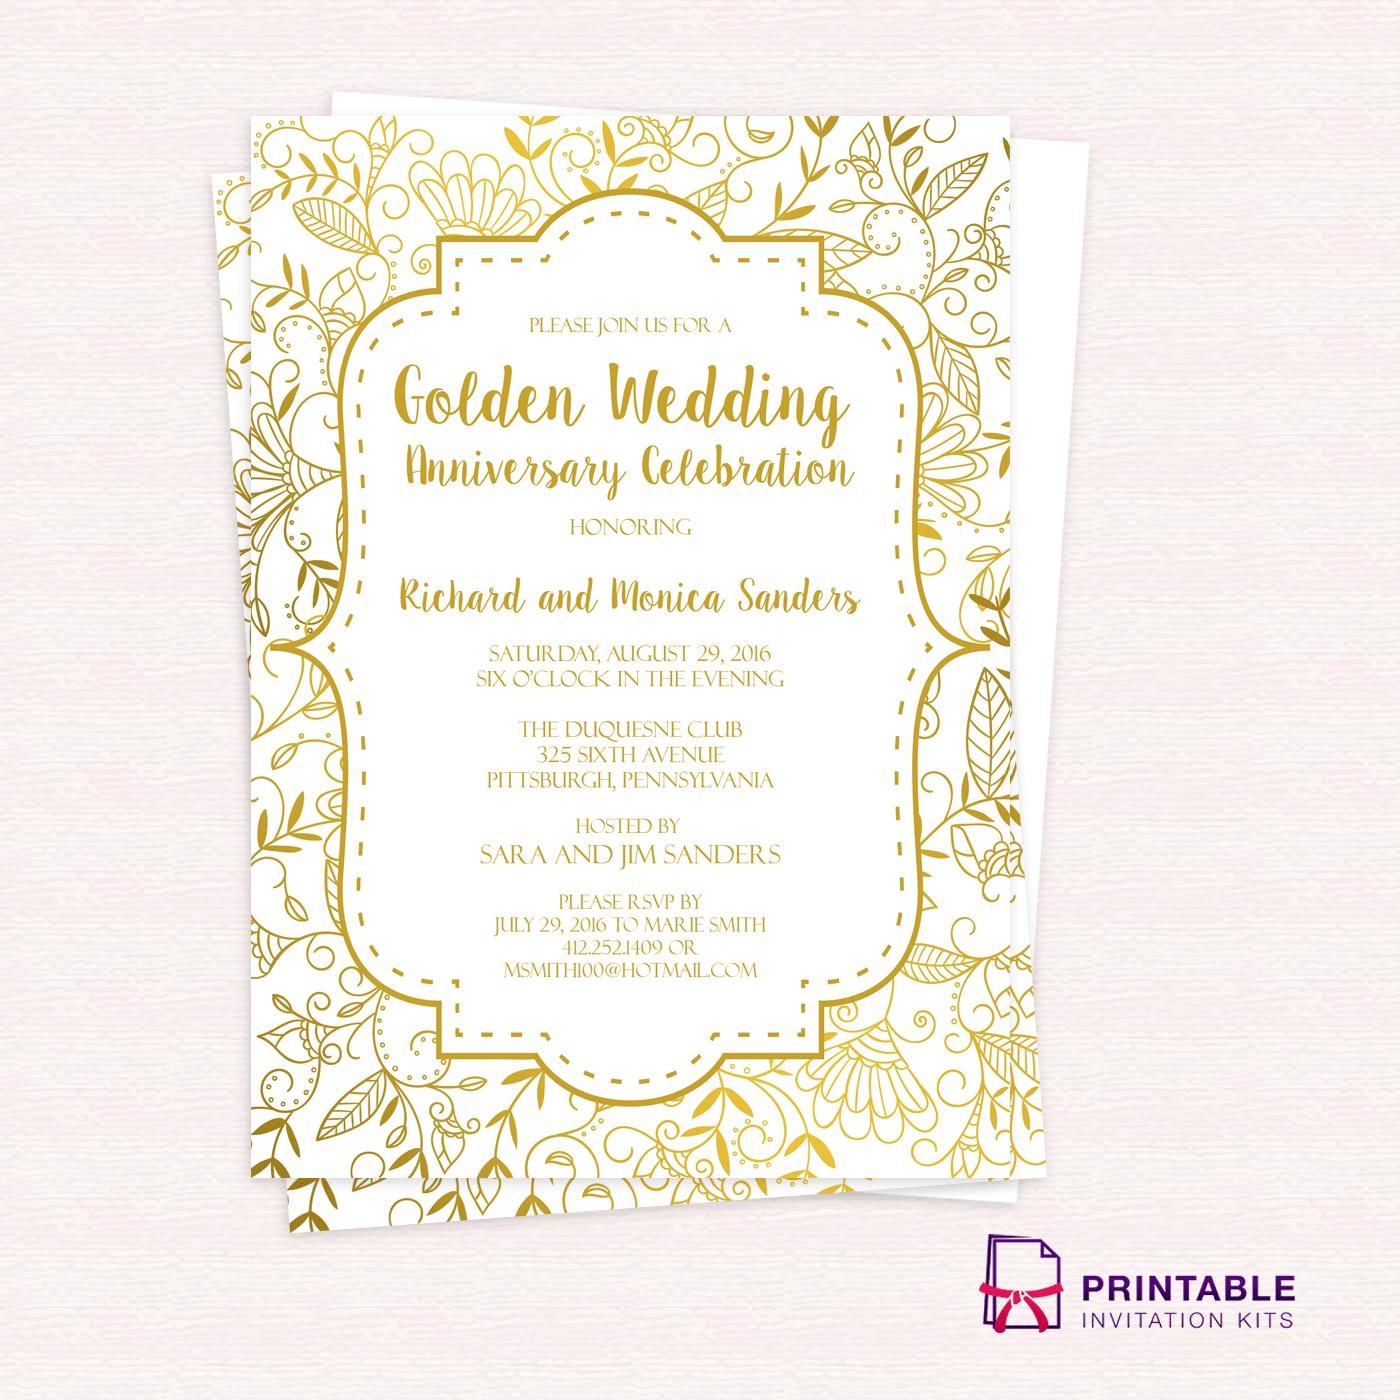 Golden Wedding Anniversary Invitation Template ← Wedding Invitation - Free Printable Monogram Wedding Invitation Templates